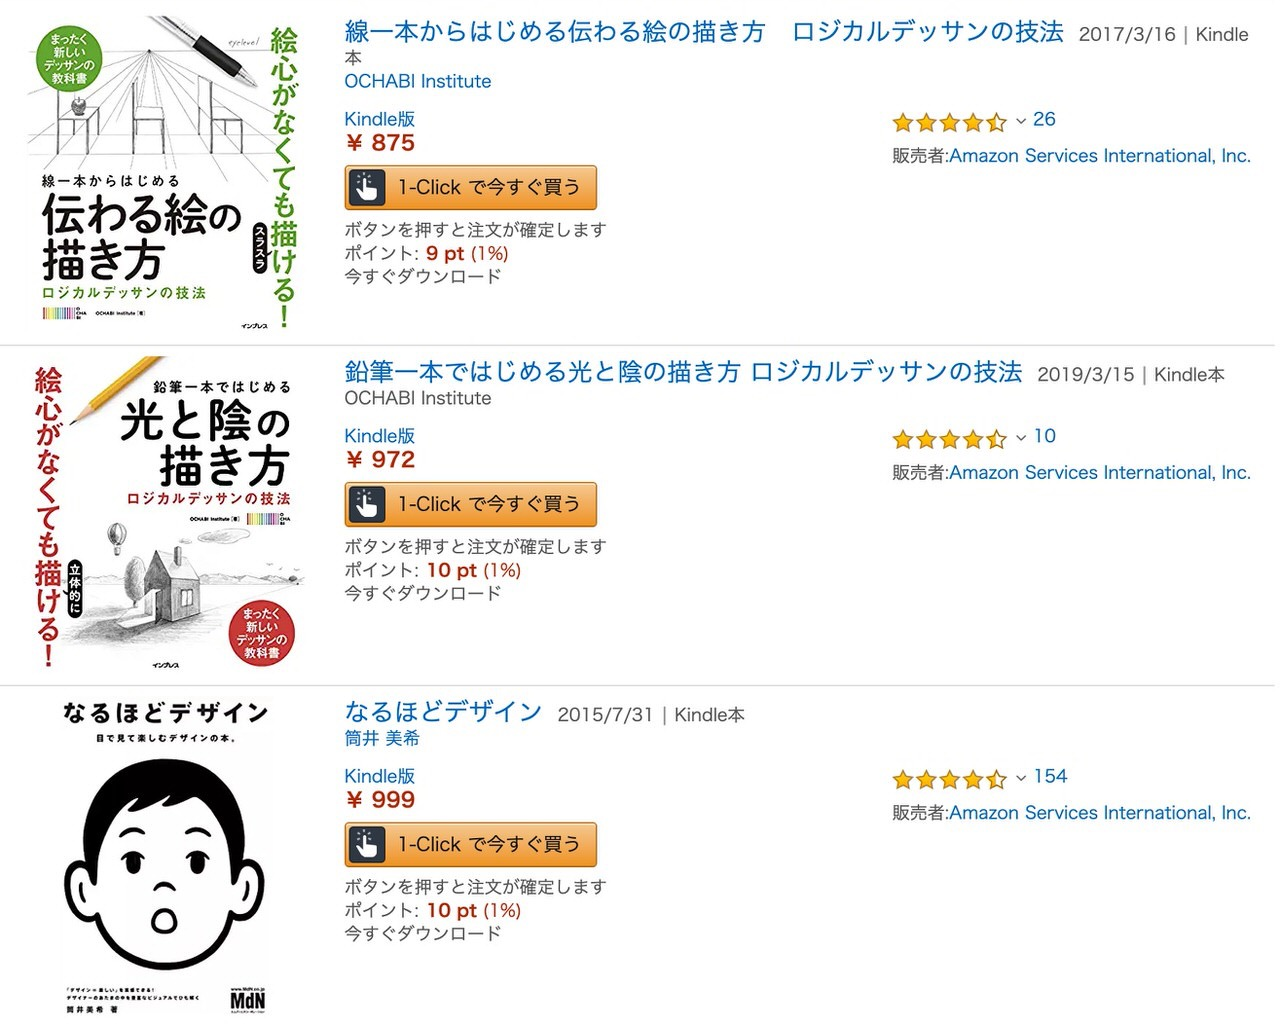 【Kindleセール】50%以上オフ多数「イラスト描画・キャラクター表現の上達に役立つ本」フェア(9/19まで)